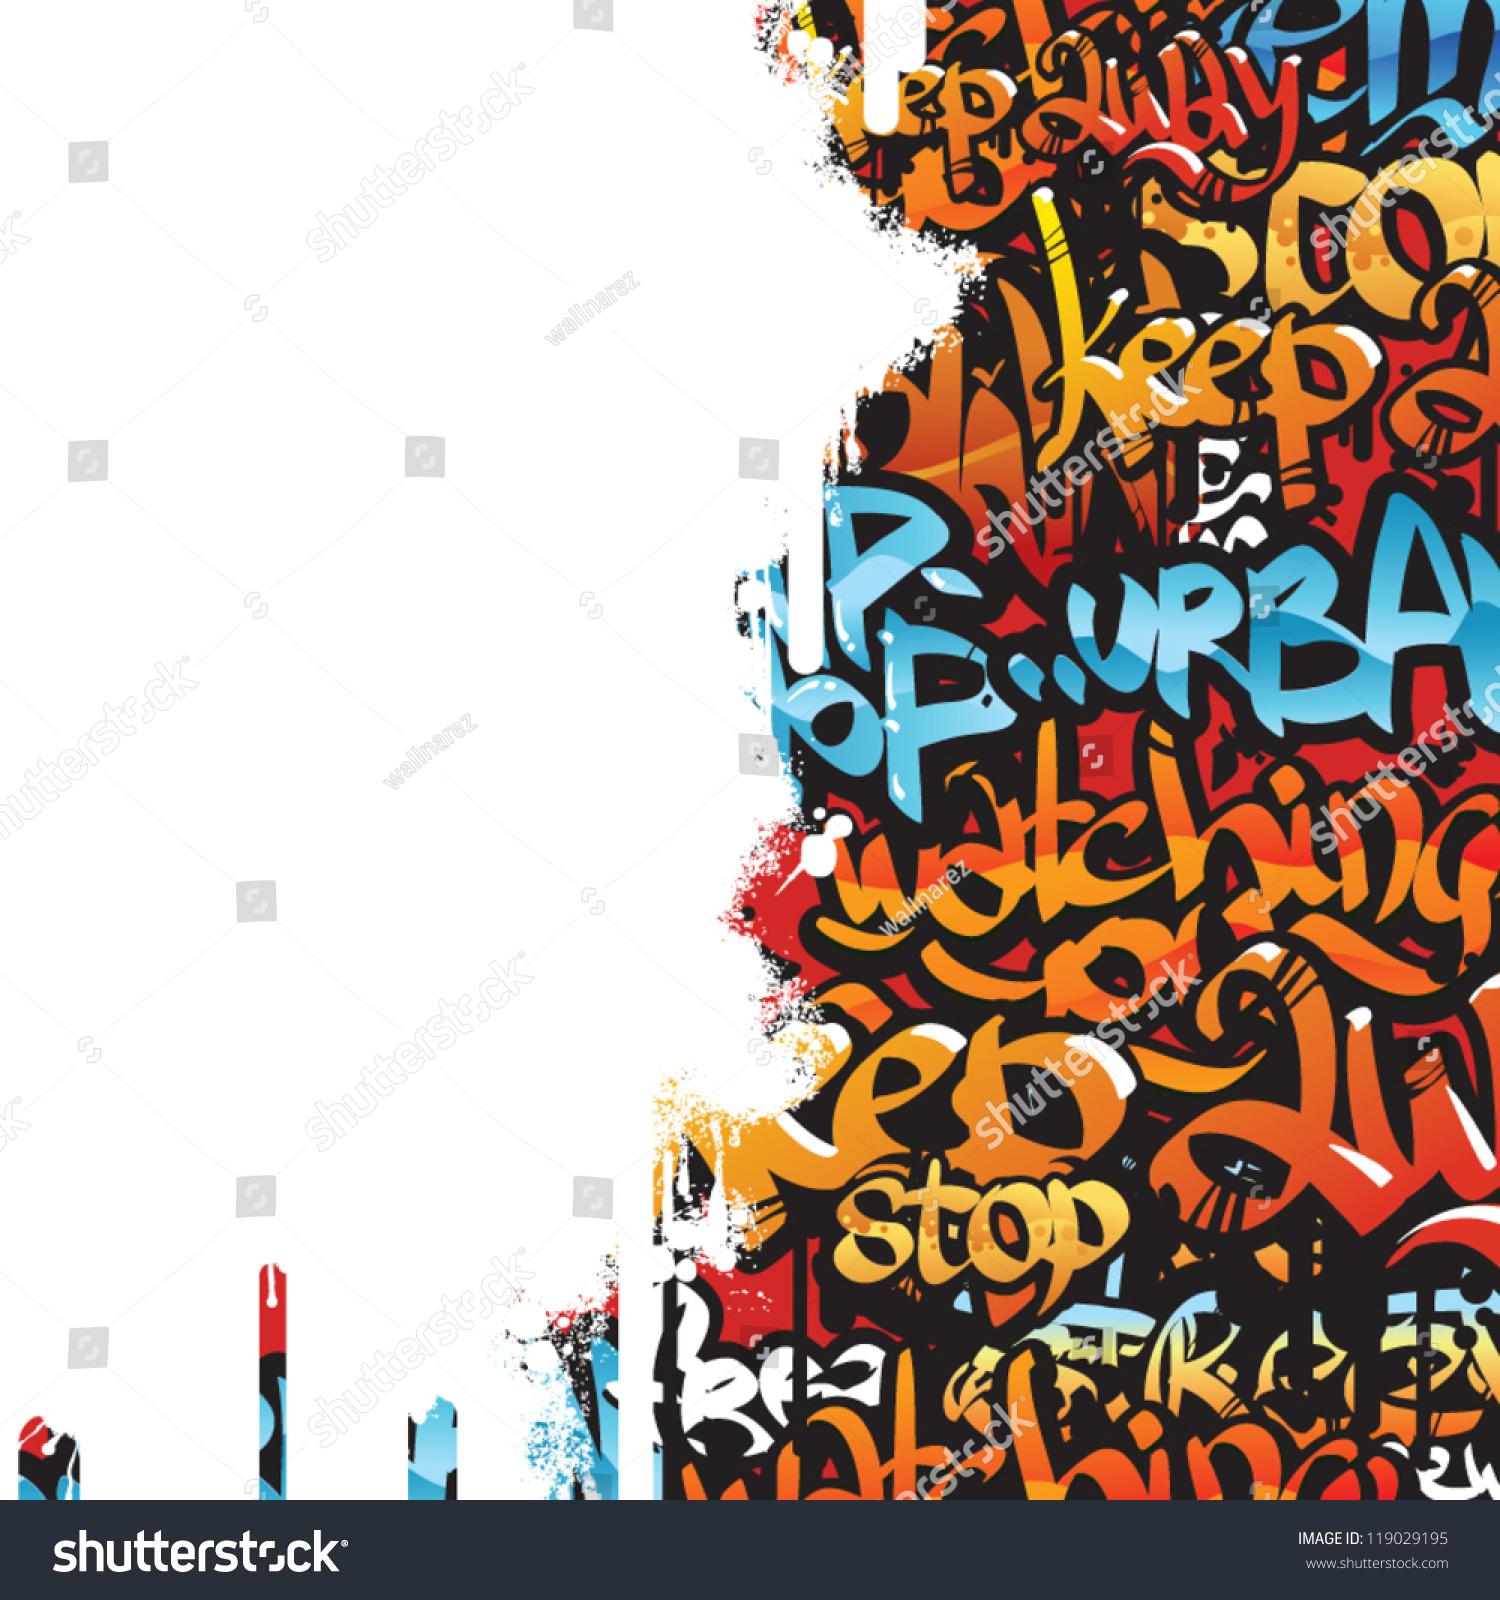 Graffiti Vector Background Design Simple Text Stock Vektorgrafik